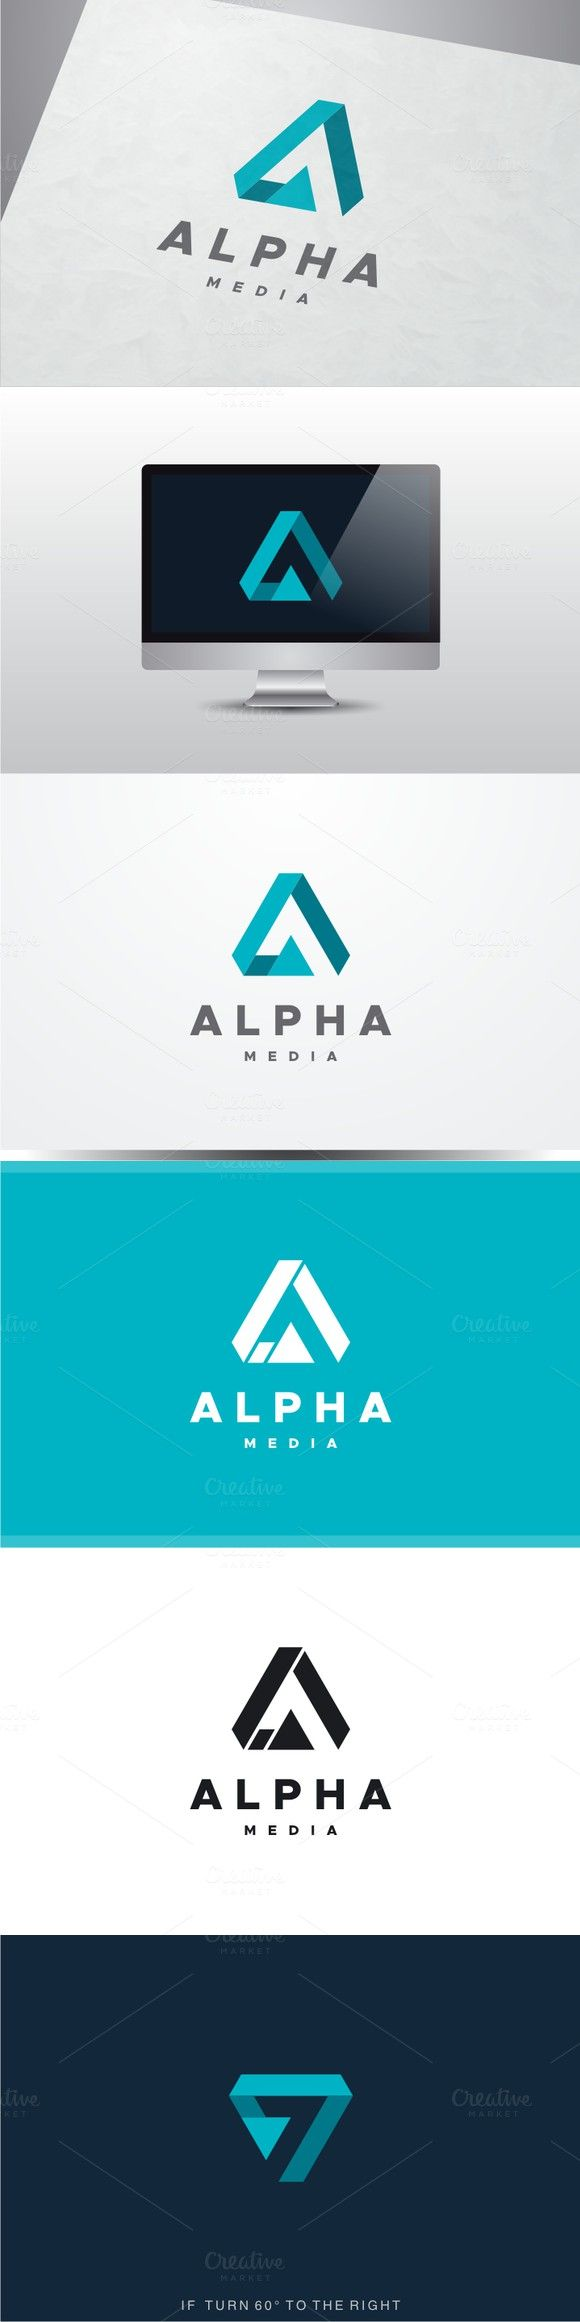 Alpha Media - Letter A Logo. Technology icons. $30.00